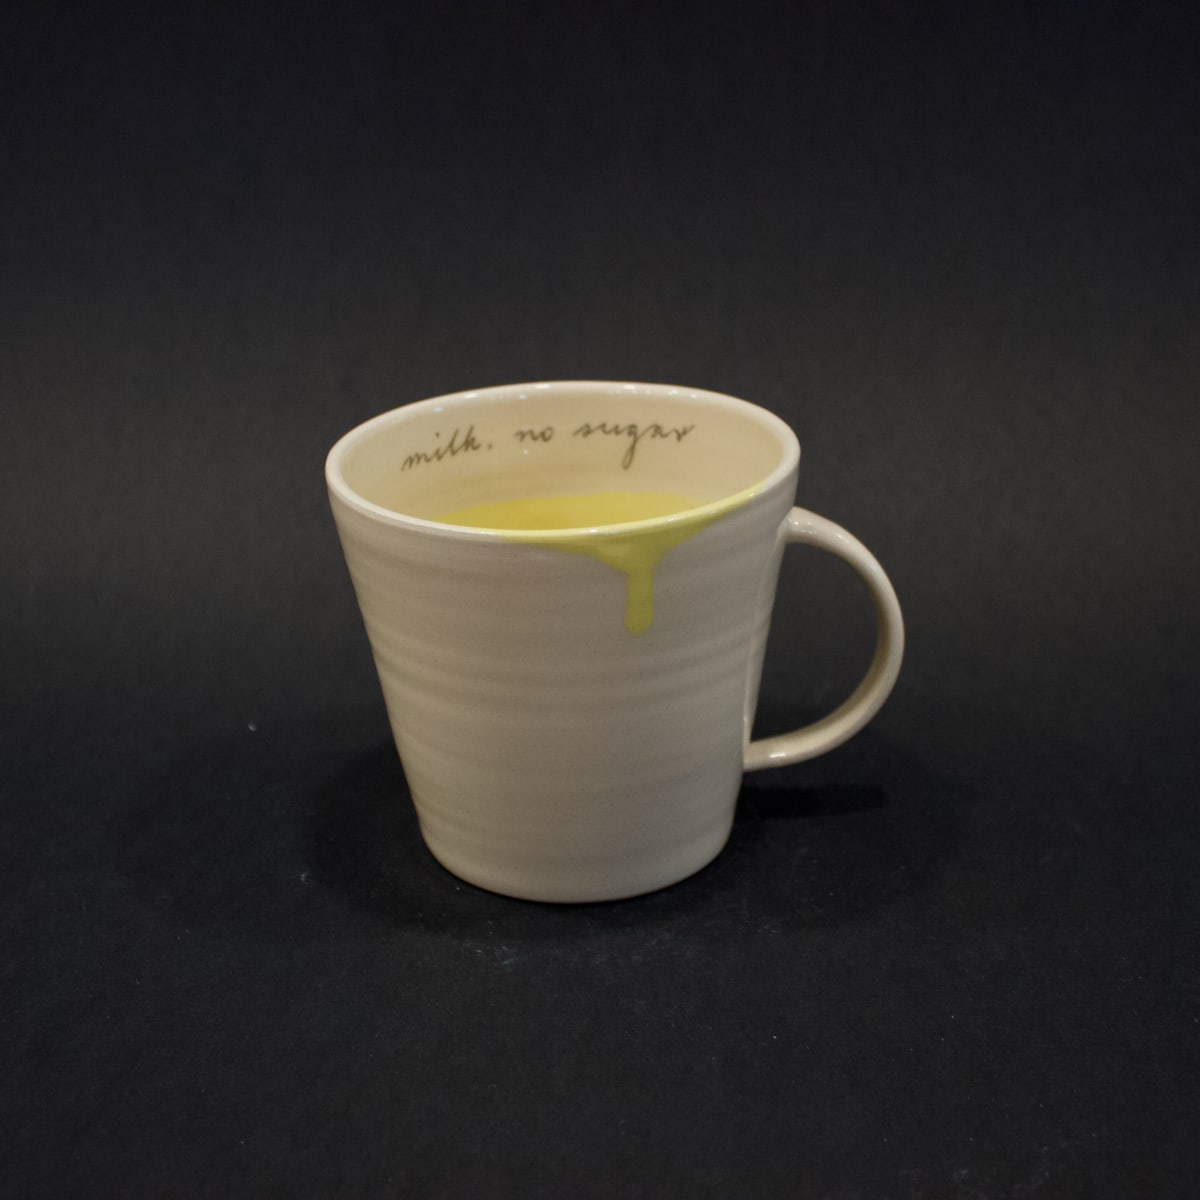 Alice Funge Mug Lemon Yellow, 2019 Stoneware 10 x 8.5 x 8.5 cm 4 x 3 3/8 x 3 3/8 in